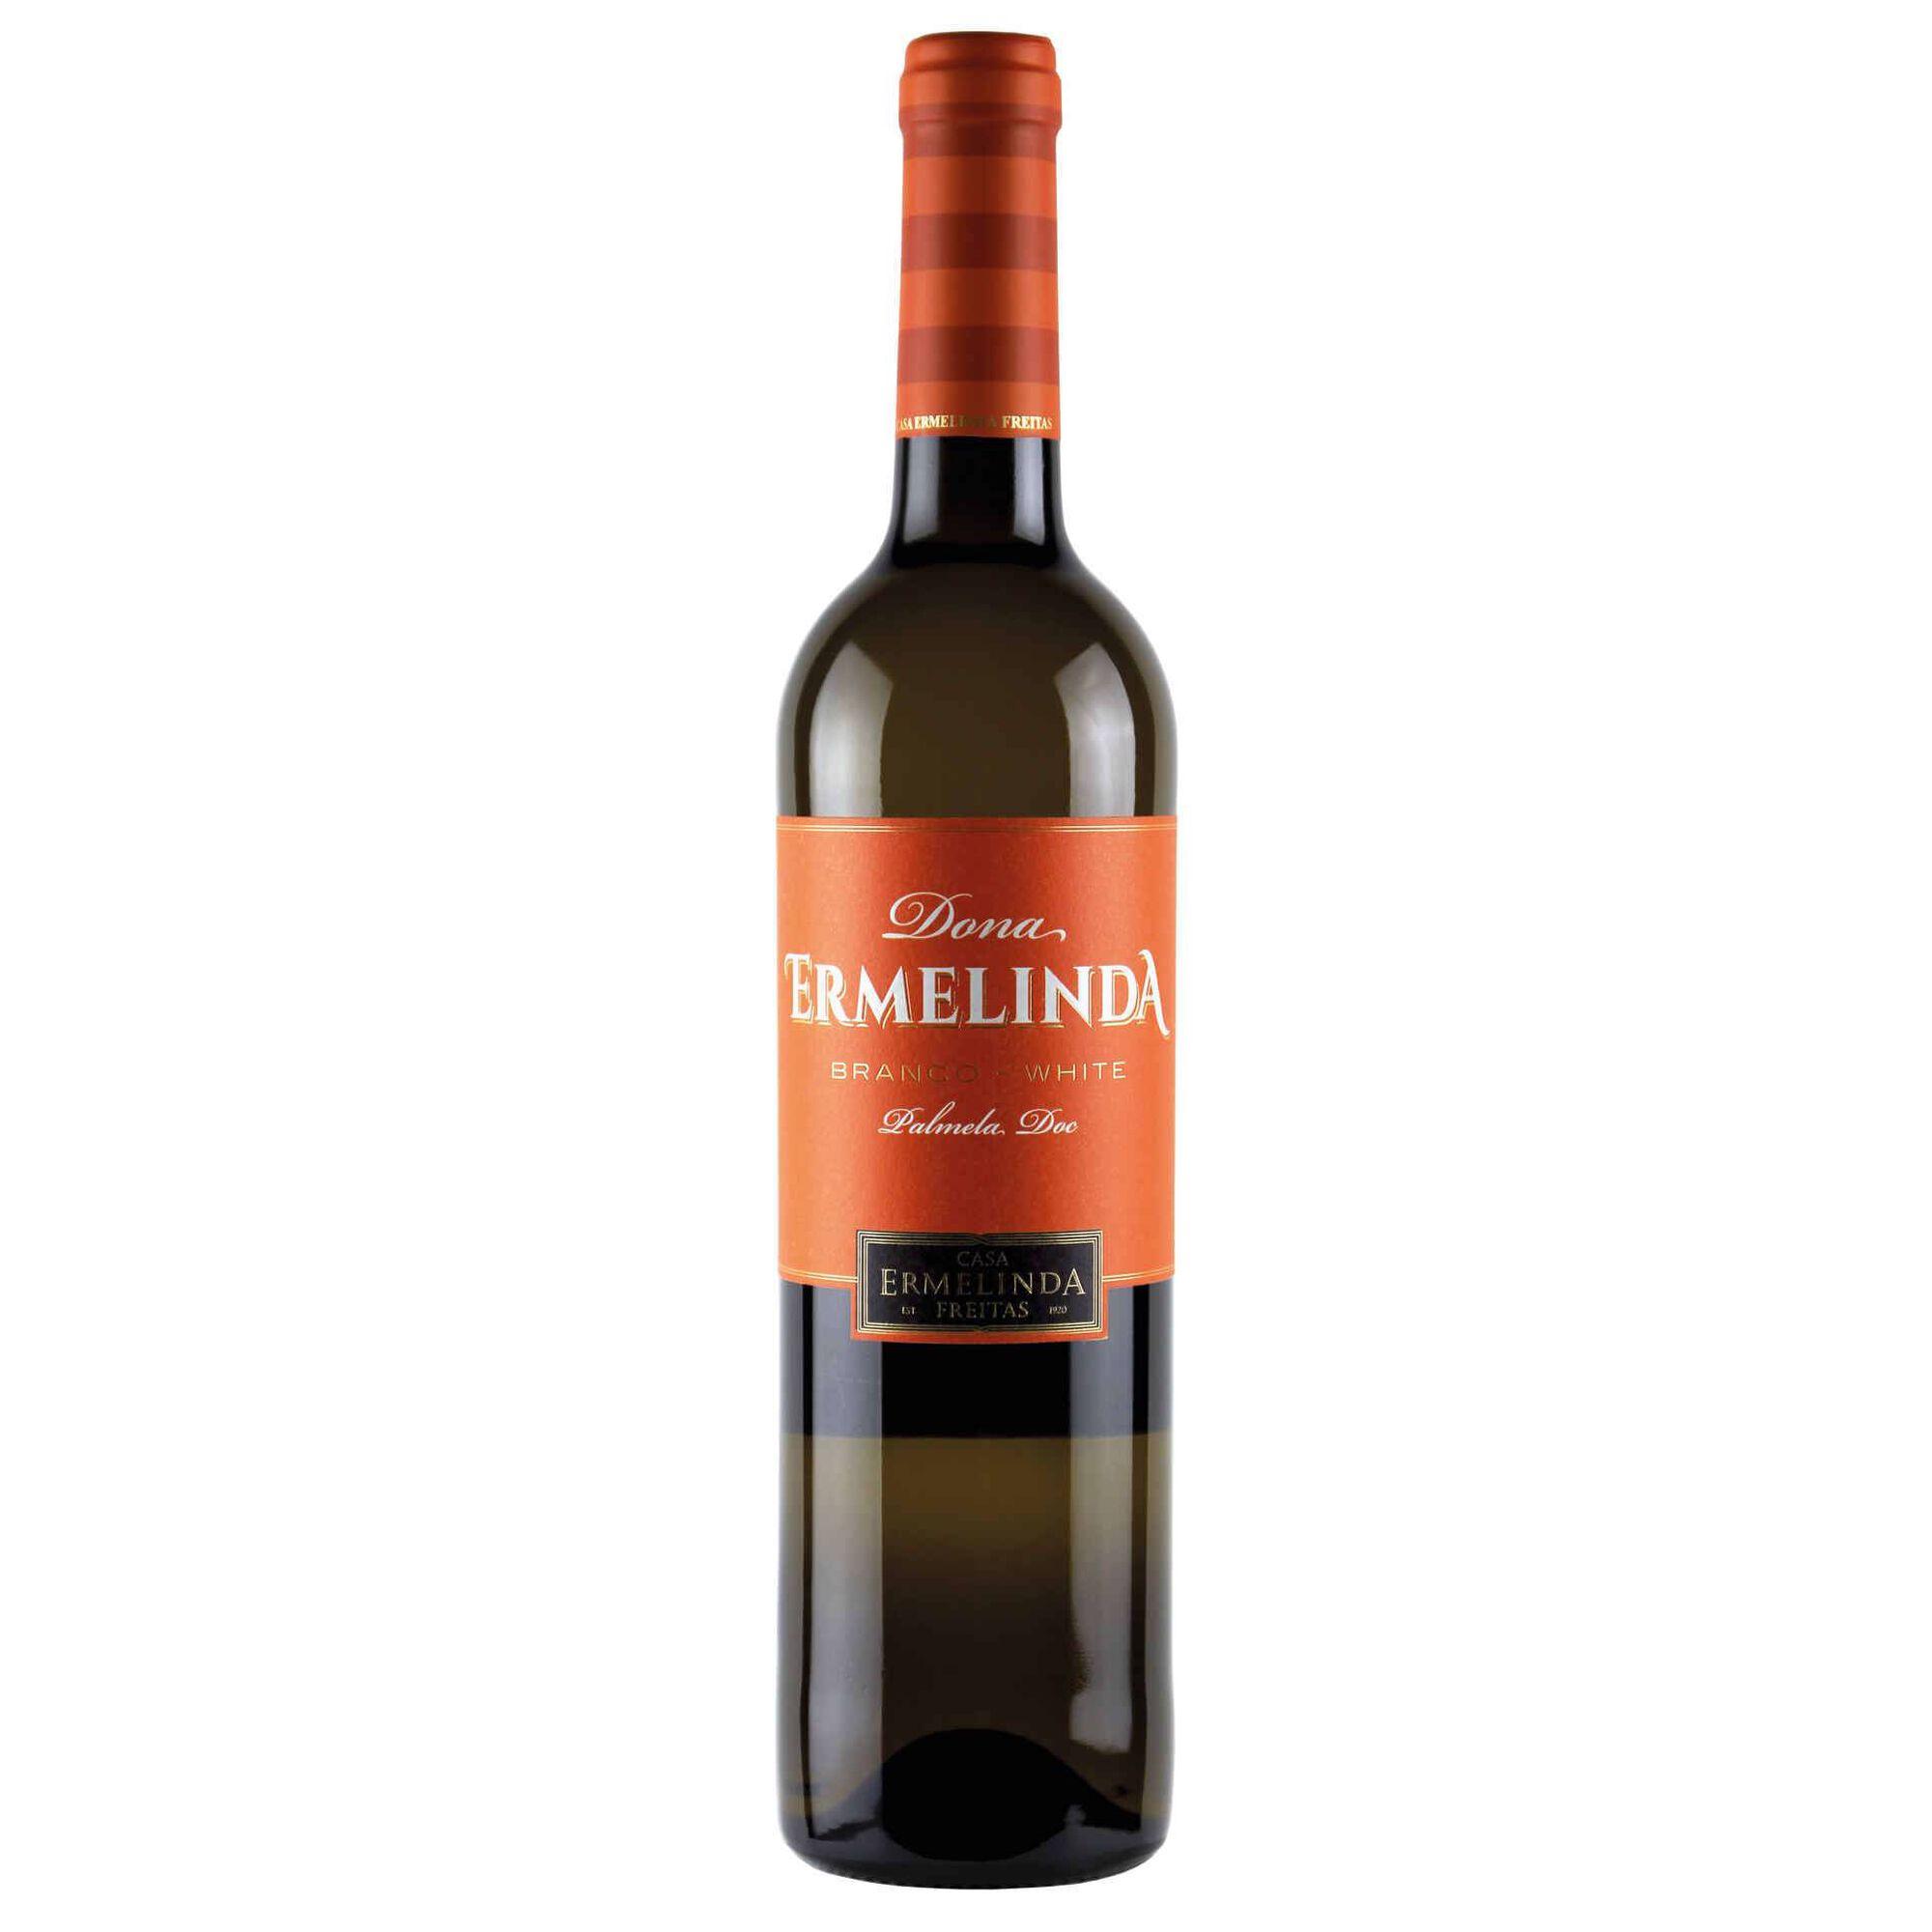 Dona Ermelinda Freitas DOC Palmela Vinho Branco